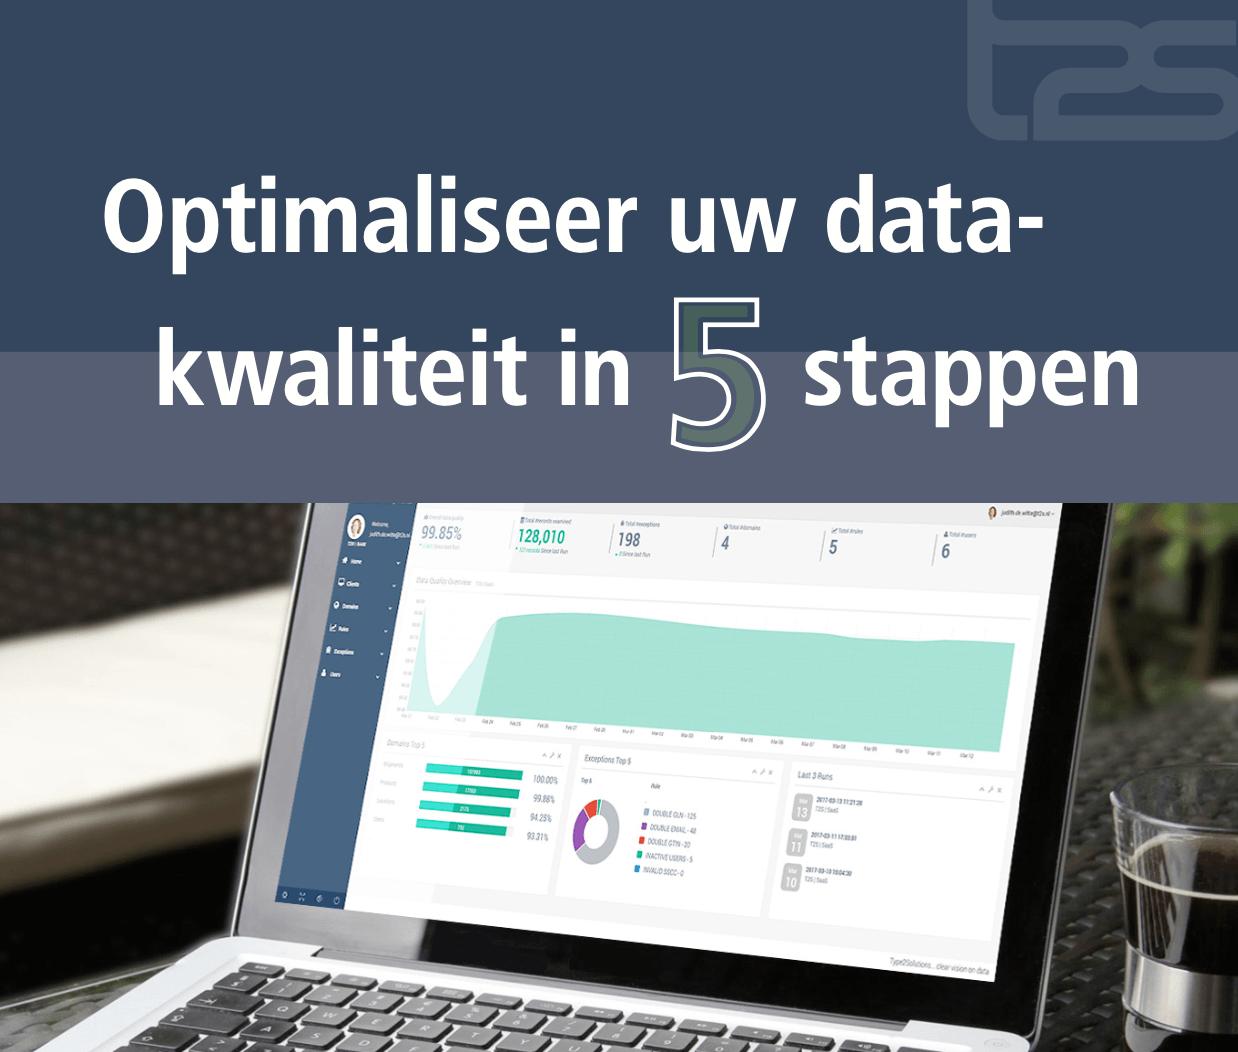 Optimaliseer datakwaliteit in 5 stappen - Type 2 Solutions